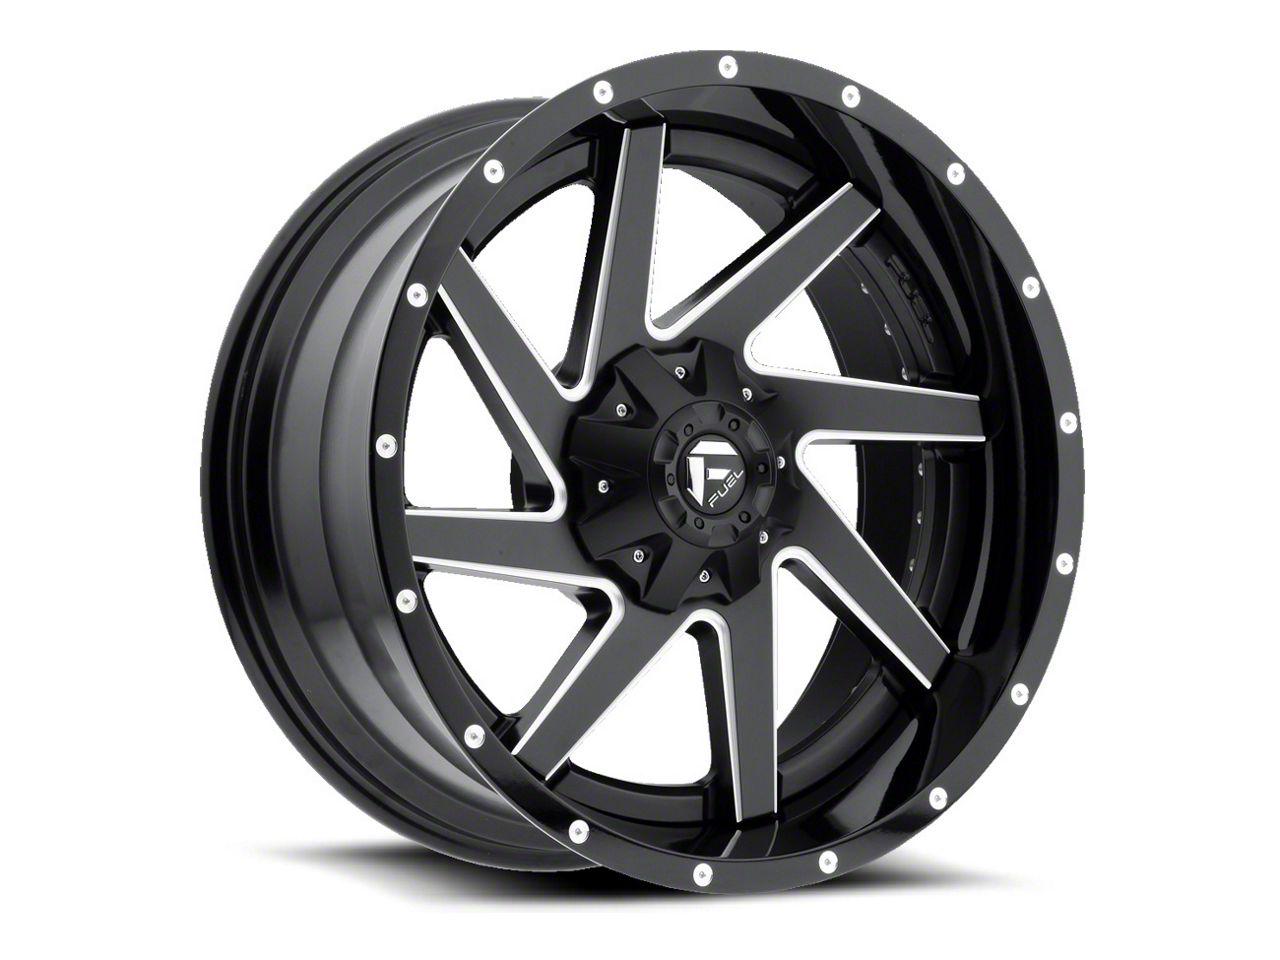 Fuel Wheels Renegade Black Milled 6-Lug Wheel - 20x12 (99-18 Silverado 1500)